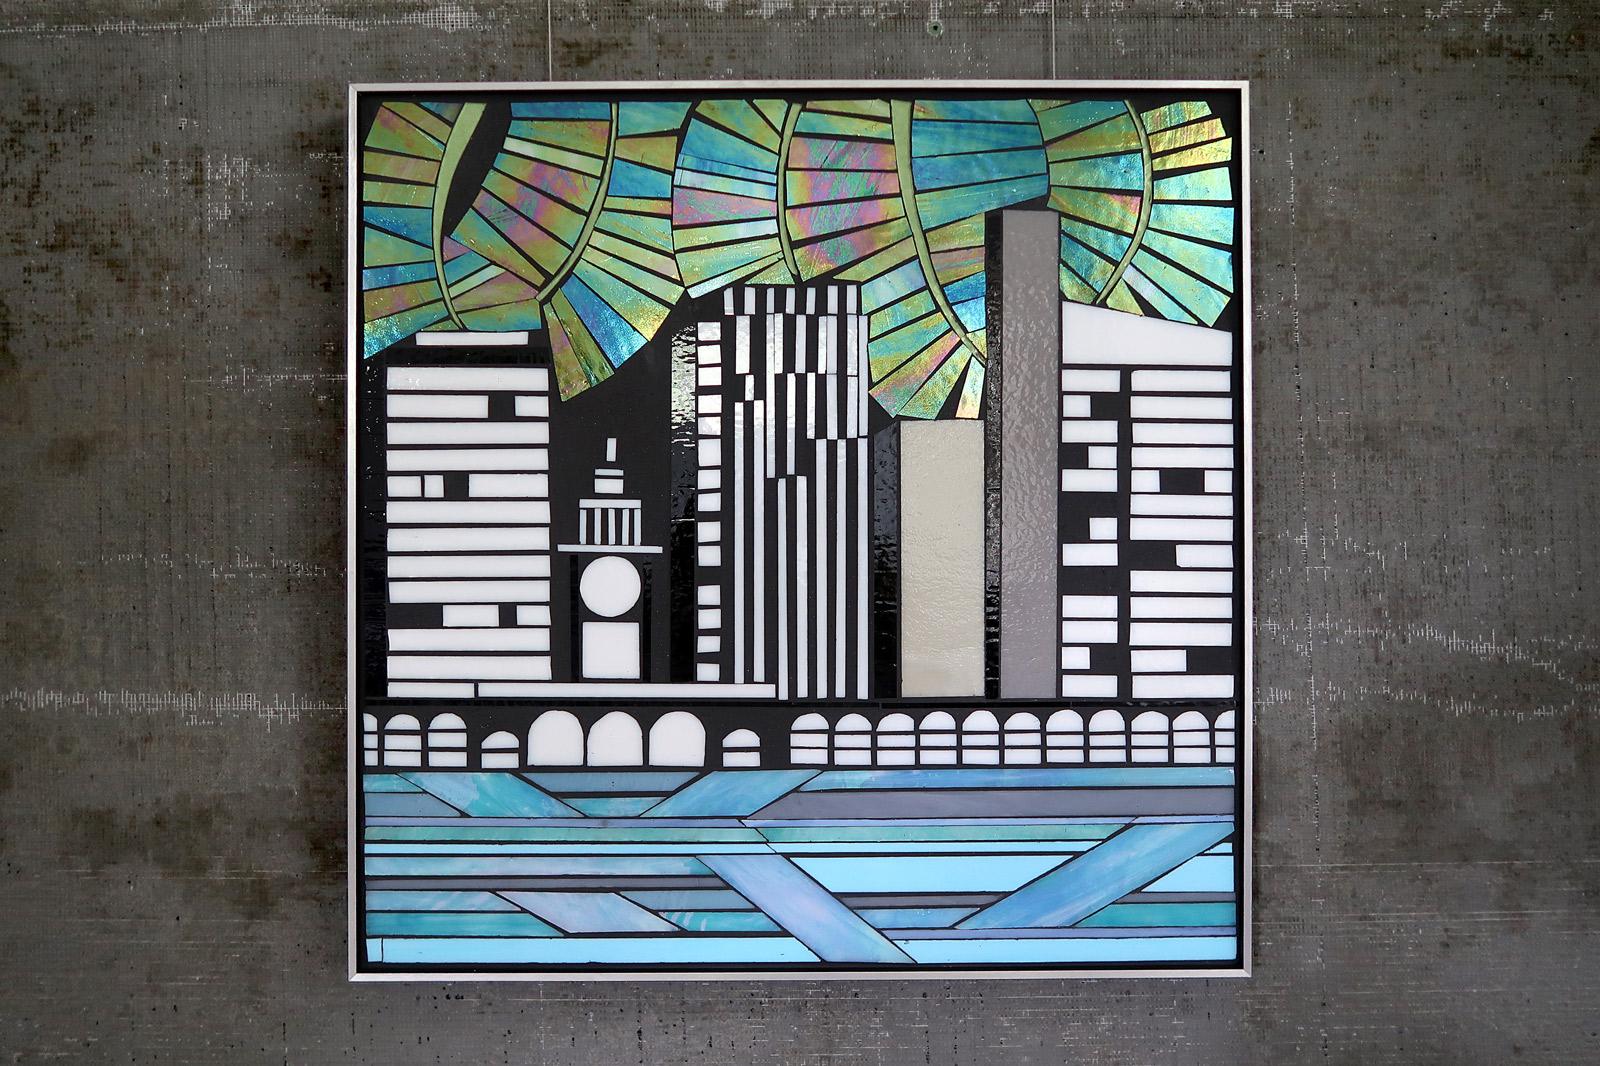 City 3.1